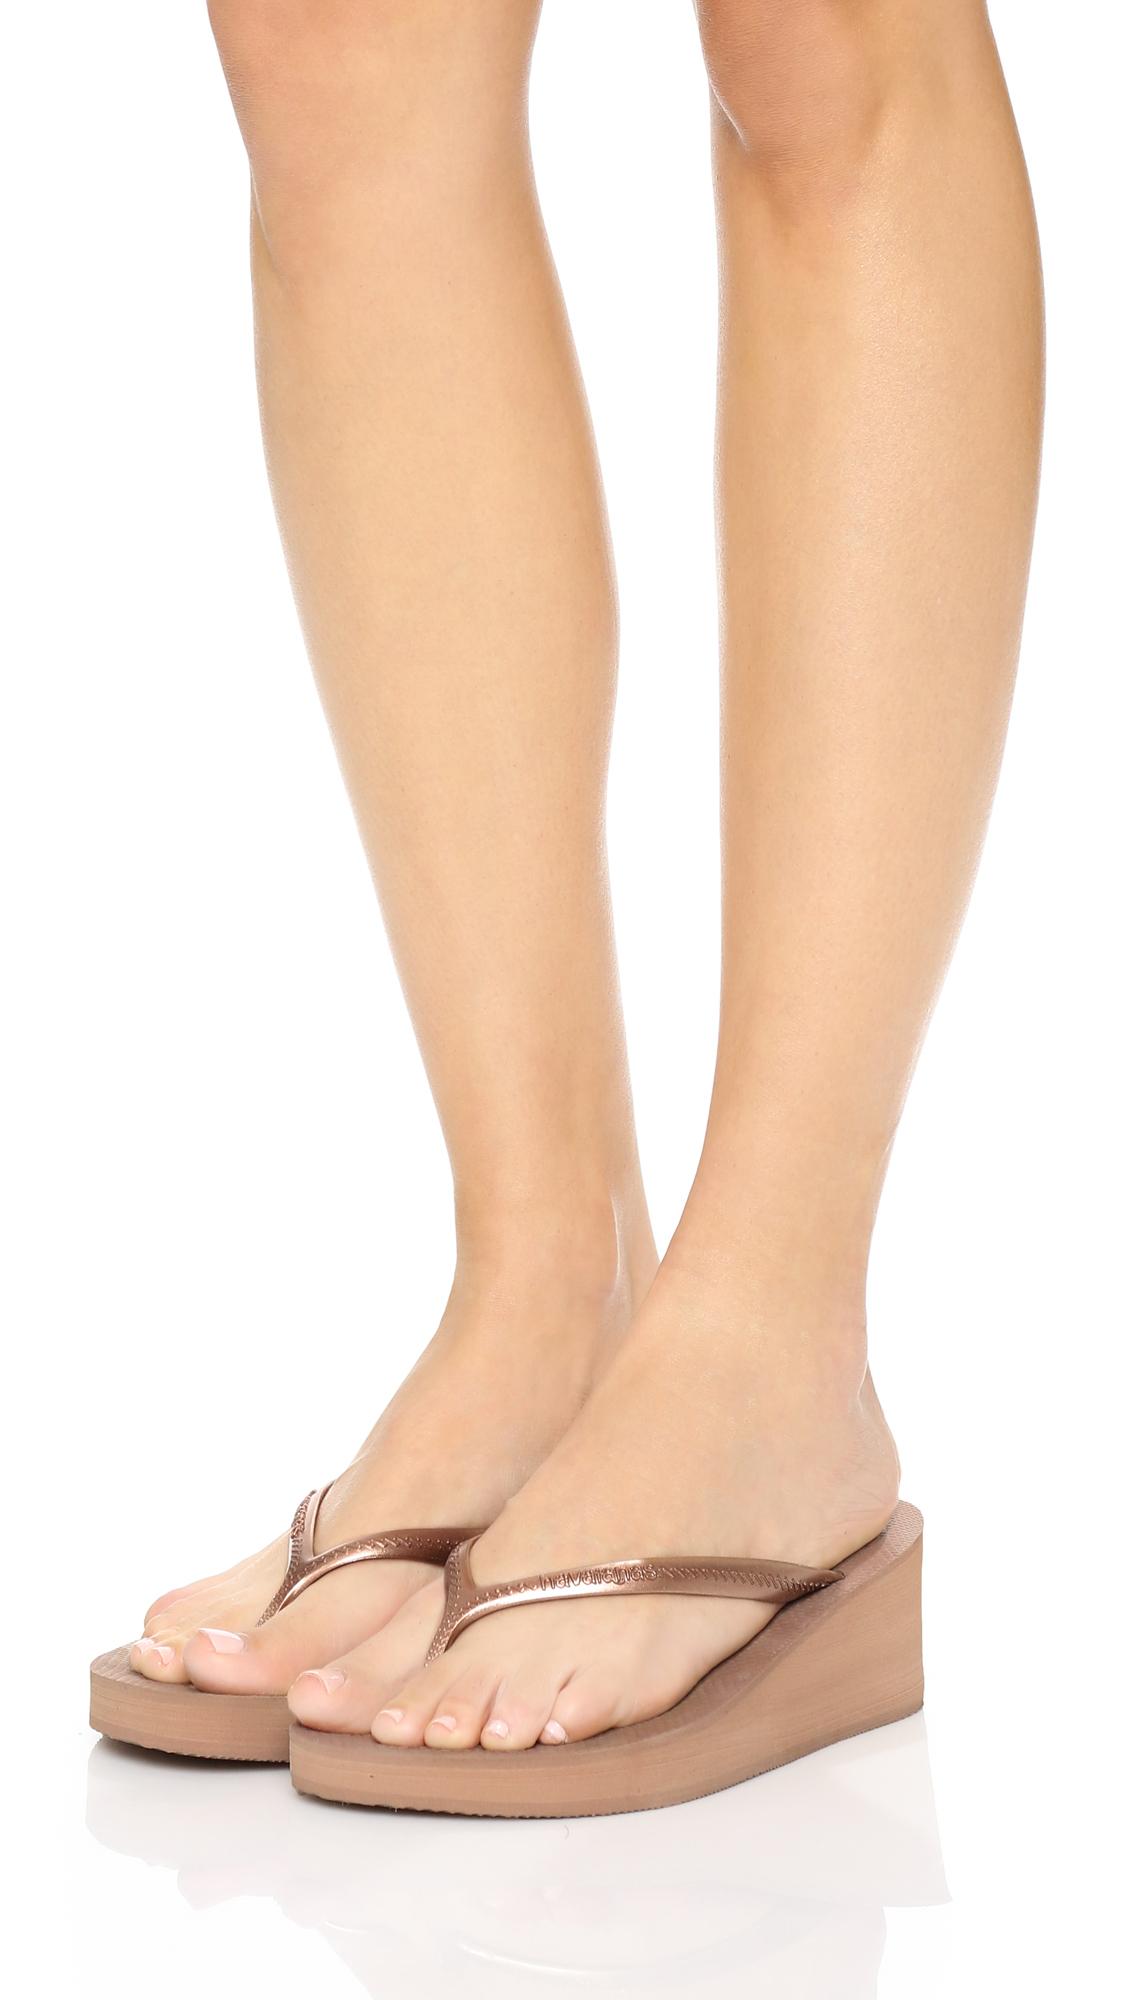 8bd222889 Lyst - Havaianas High Fashion Wedge Flip Flops